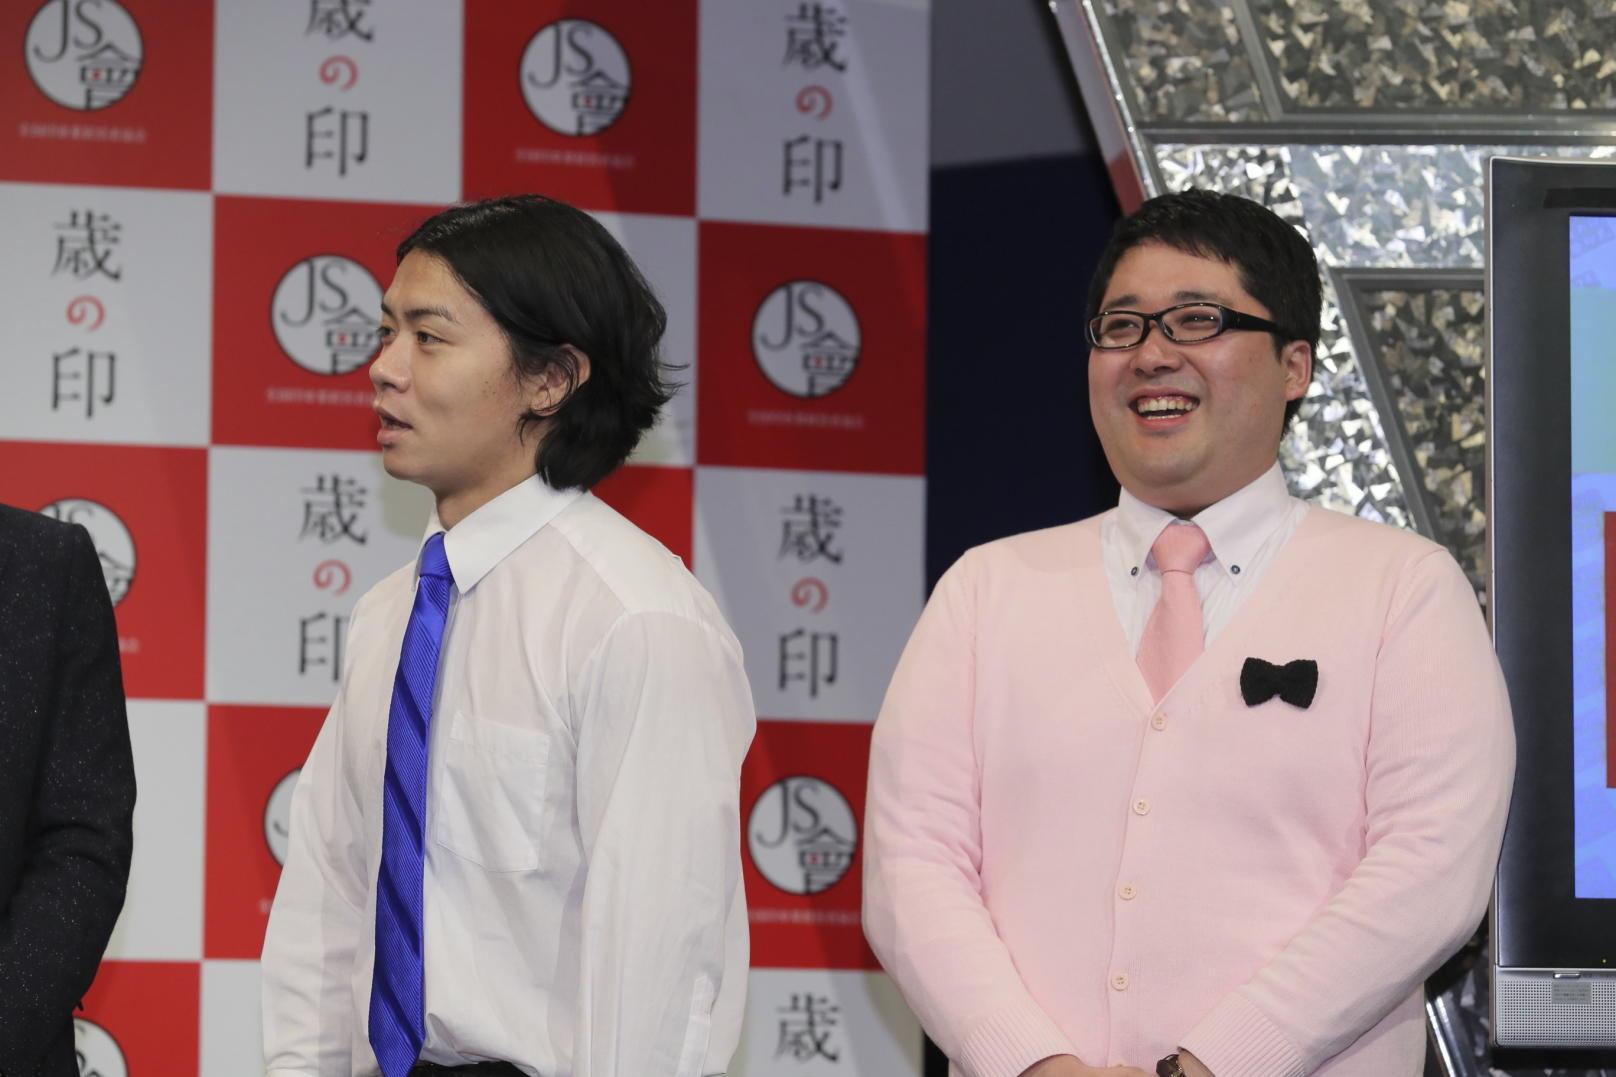 http://news.yoshimoto.co.jp/20171204171850-484ee838fae77485bffcf014348f01503e686cc9.jpg